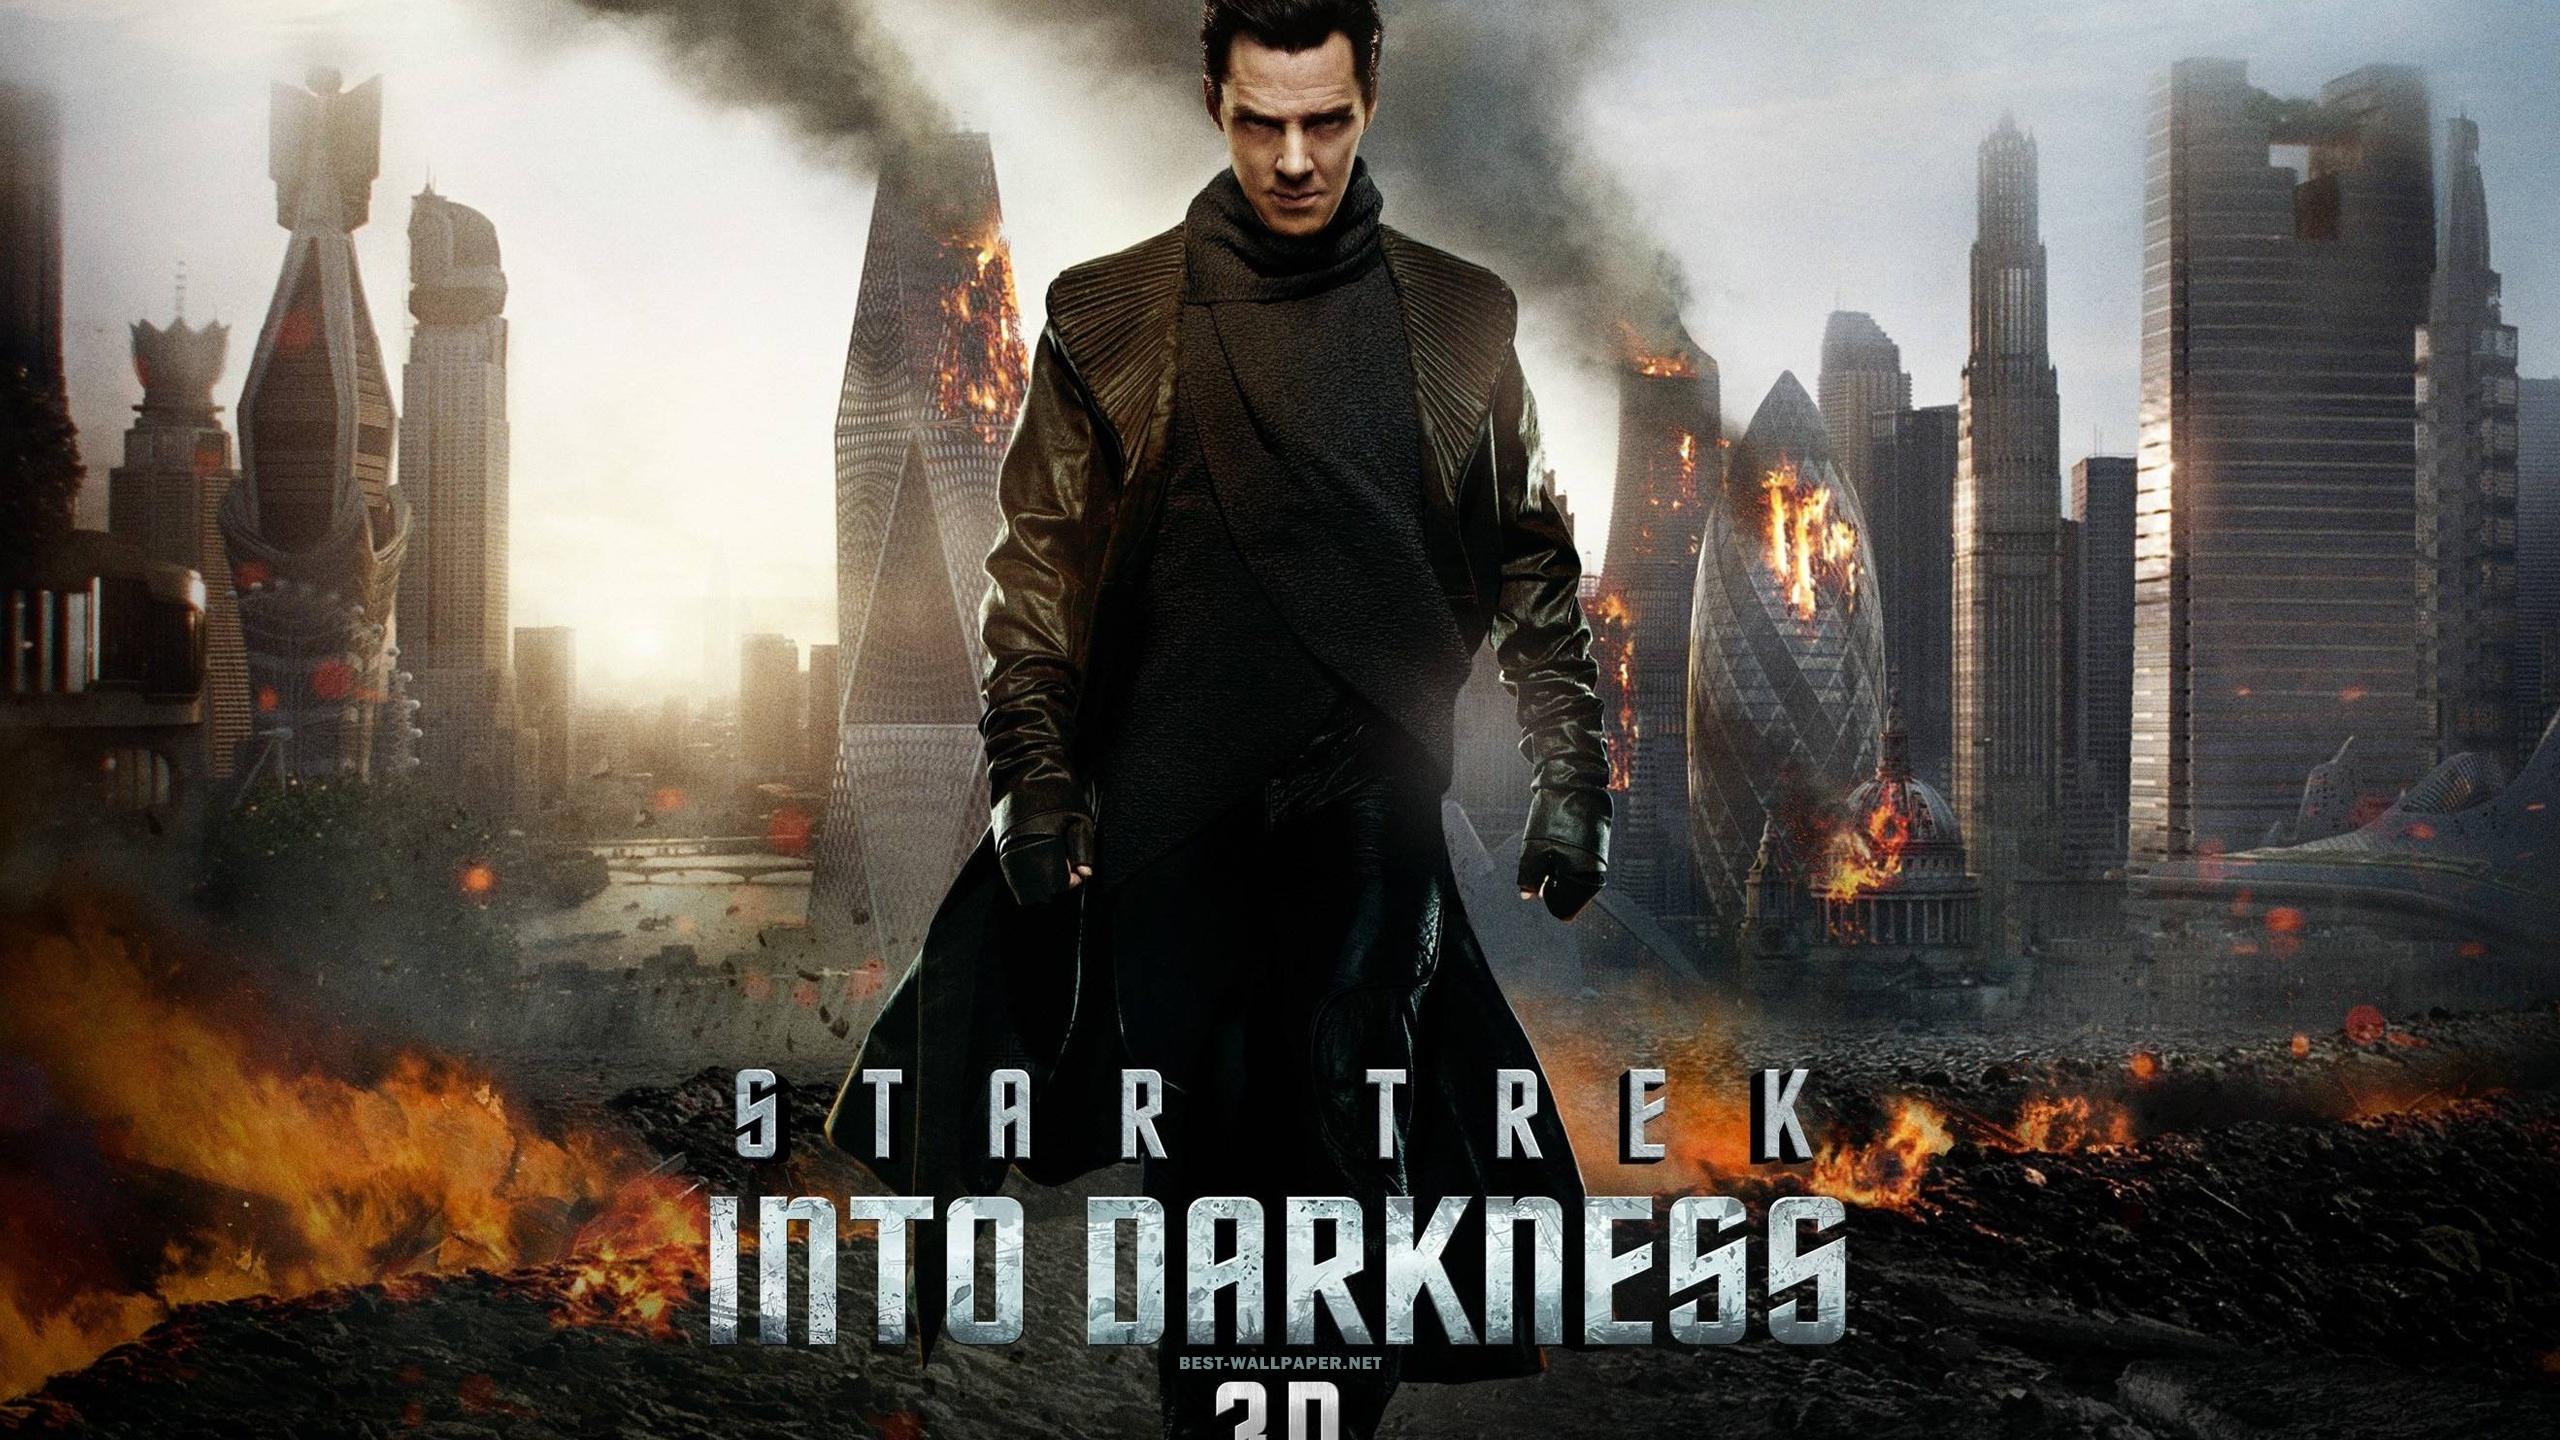 Wallpaper Star Trek Into Darkness Hd 2560x1600 Hd Picture Image